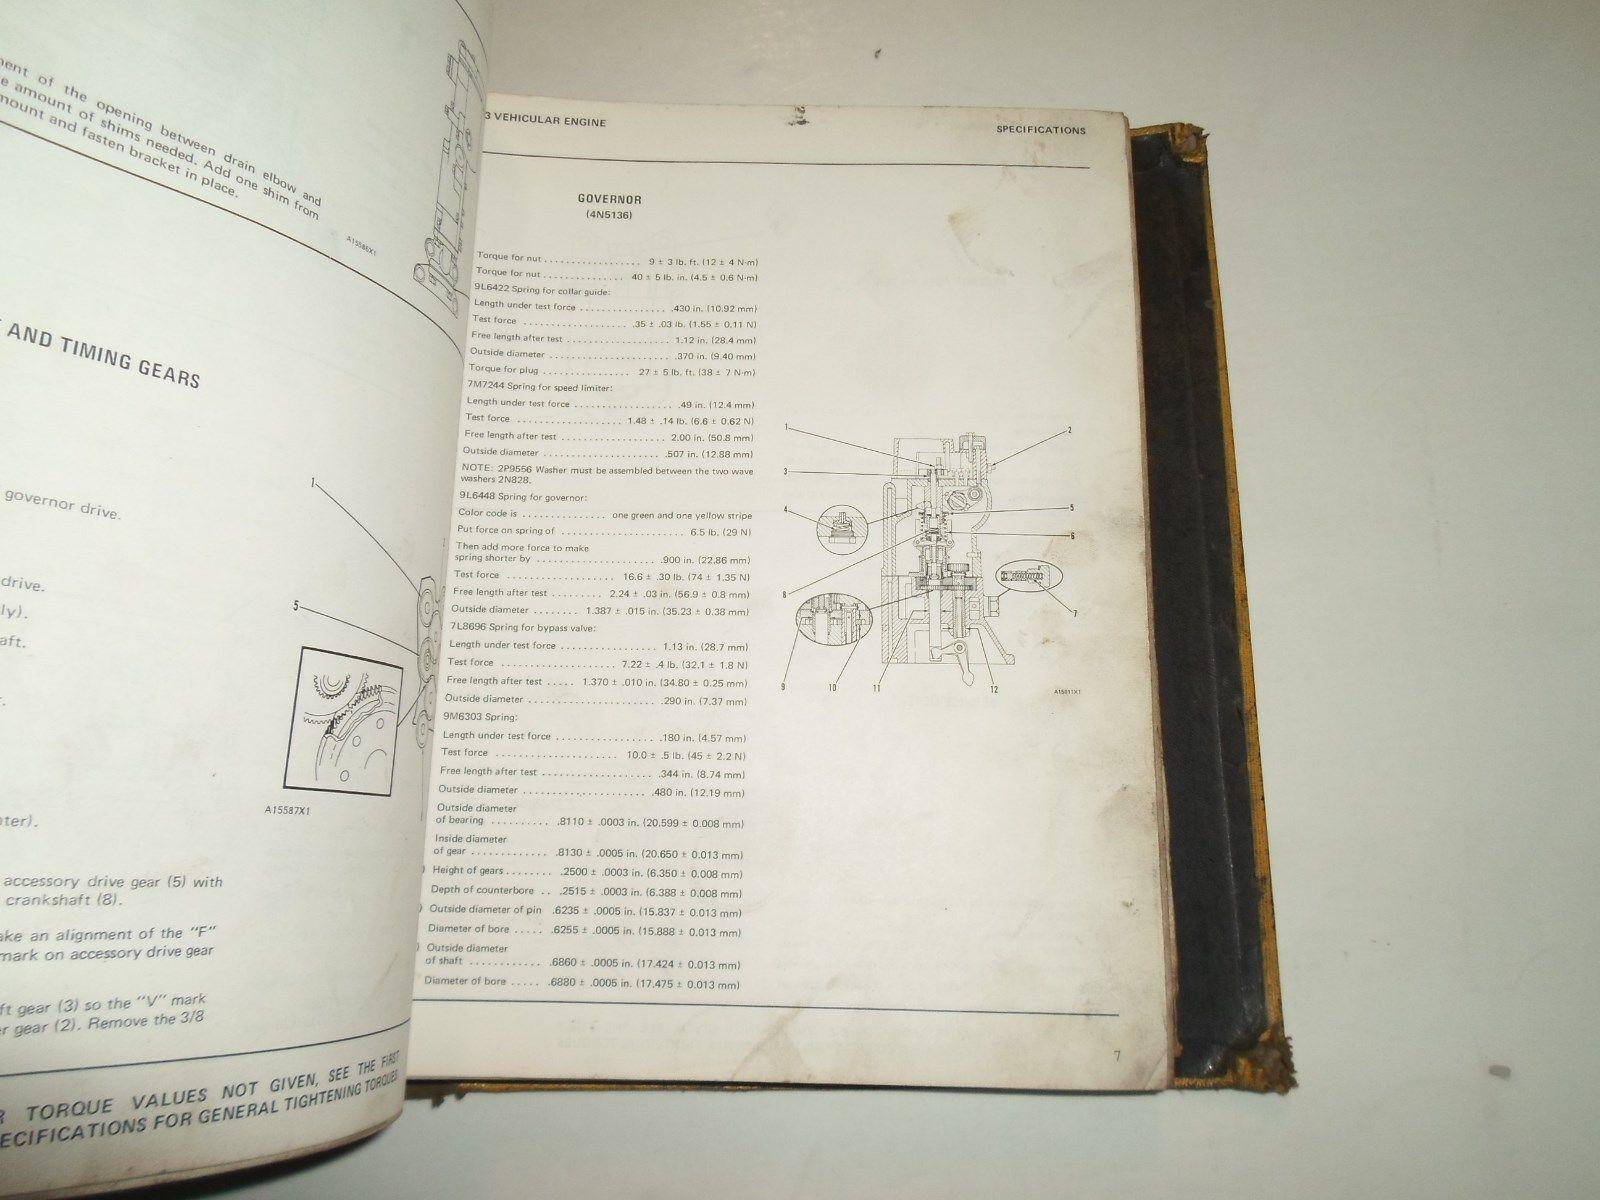 ... Caterpillar D353 Vehicular Engines Dual D9H Tractor Power Train Specs  Manual SET ...